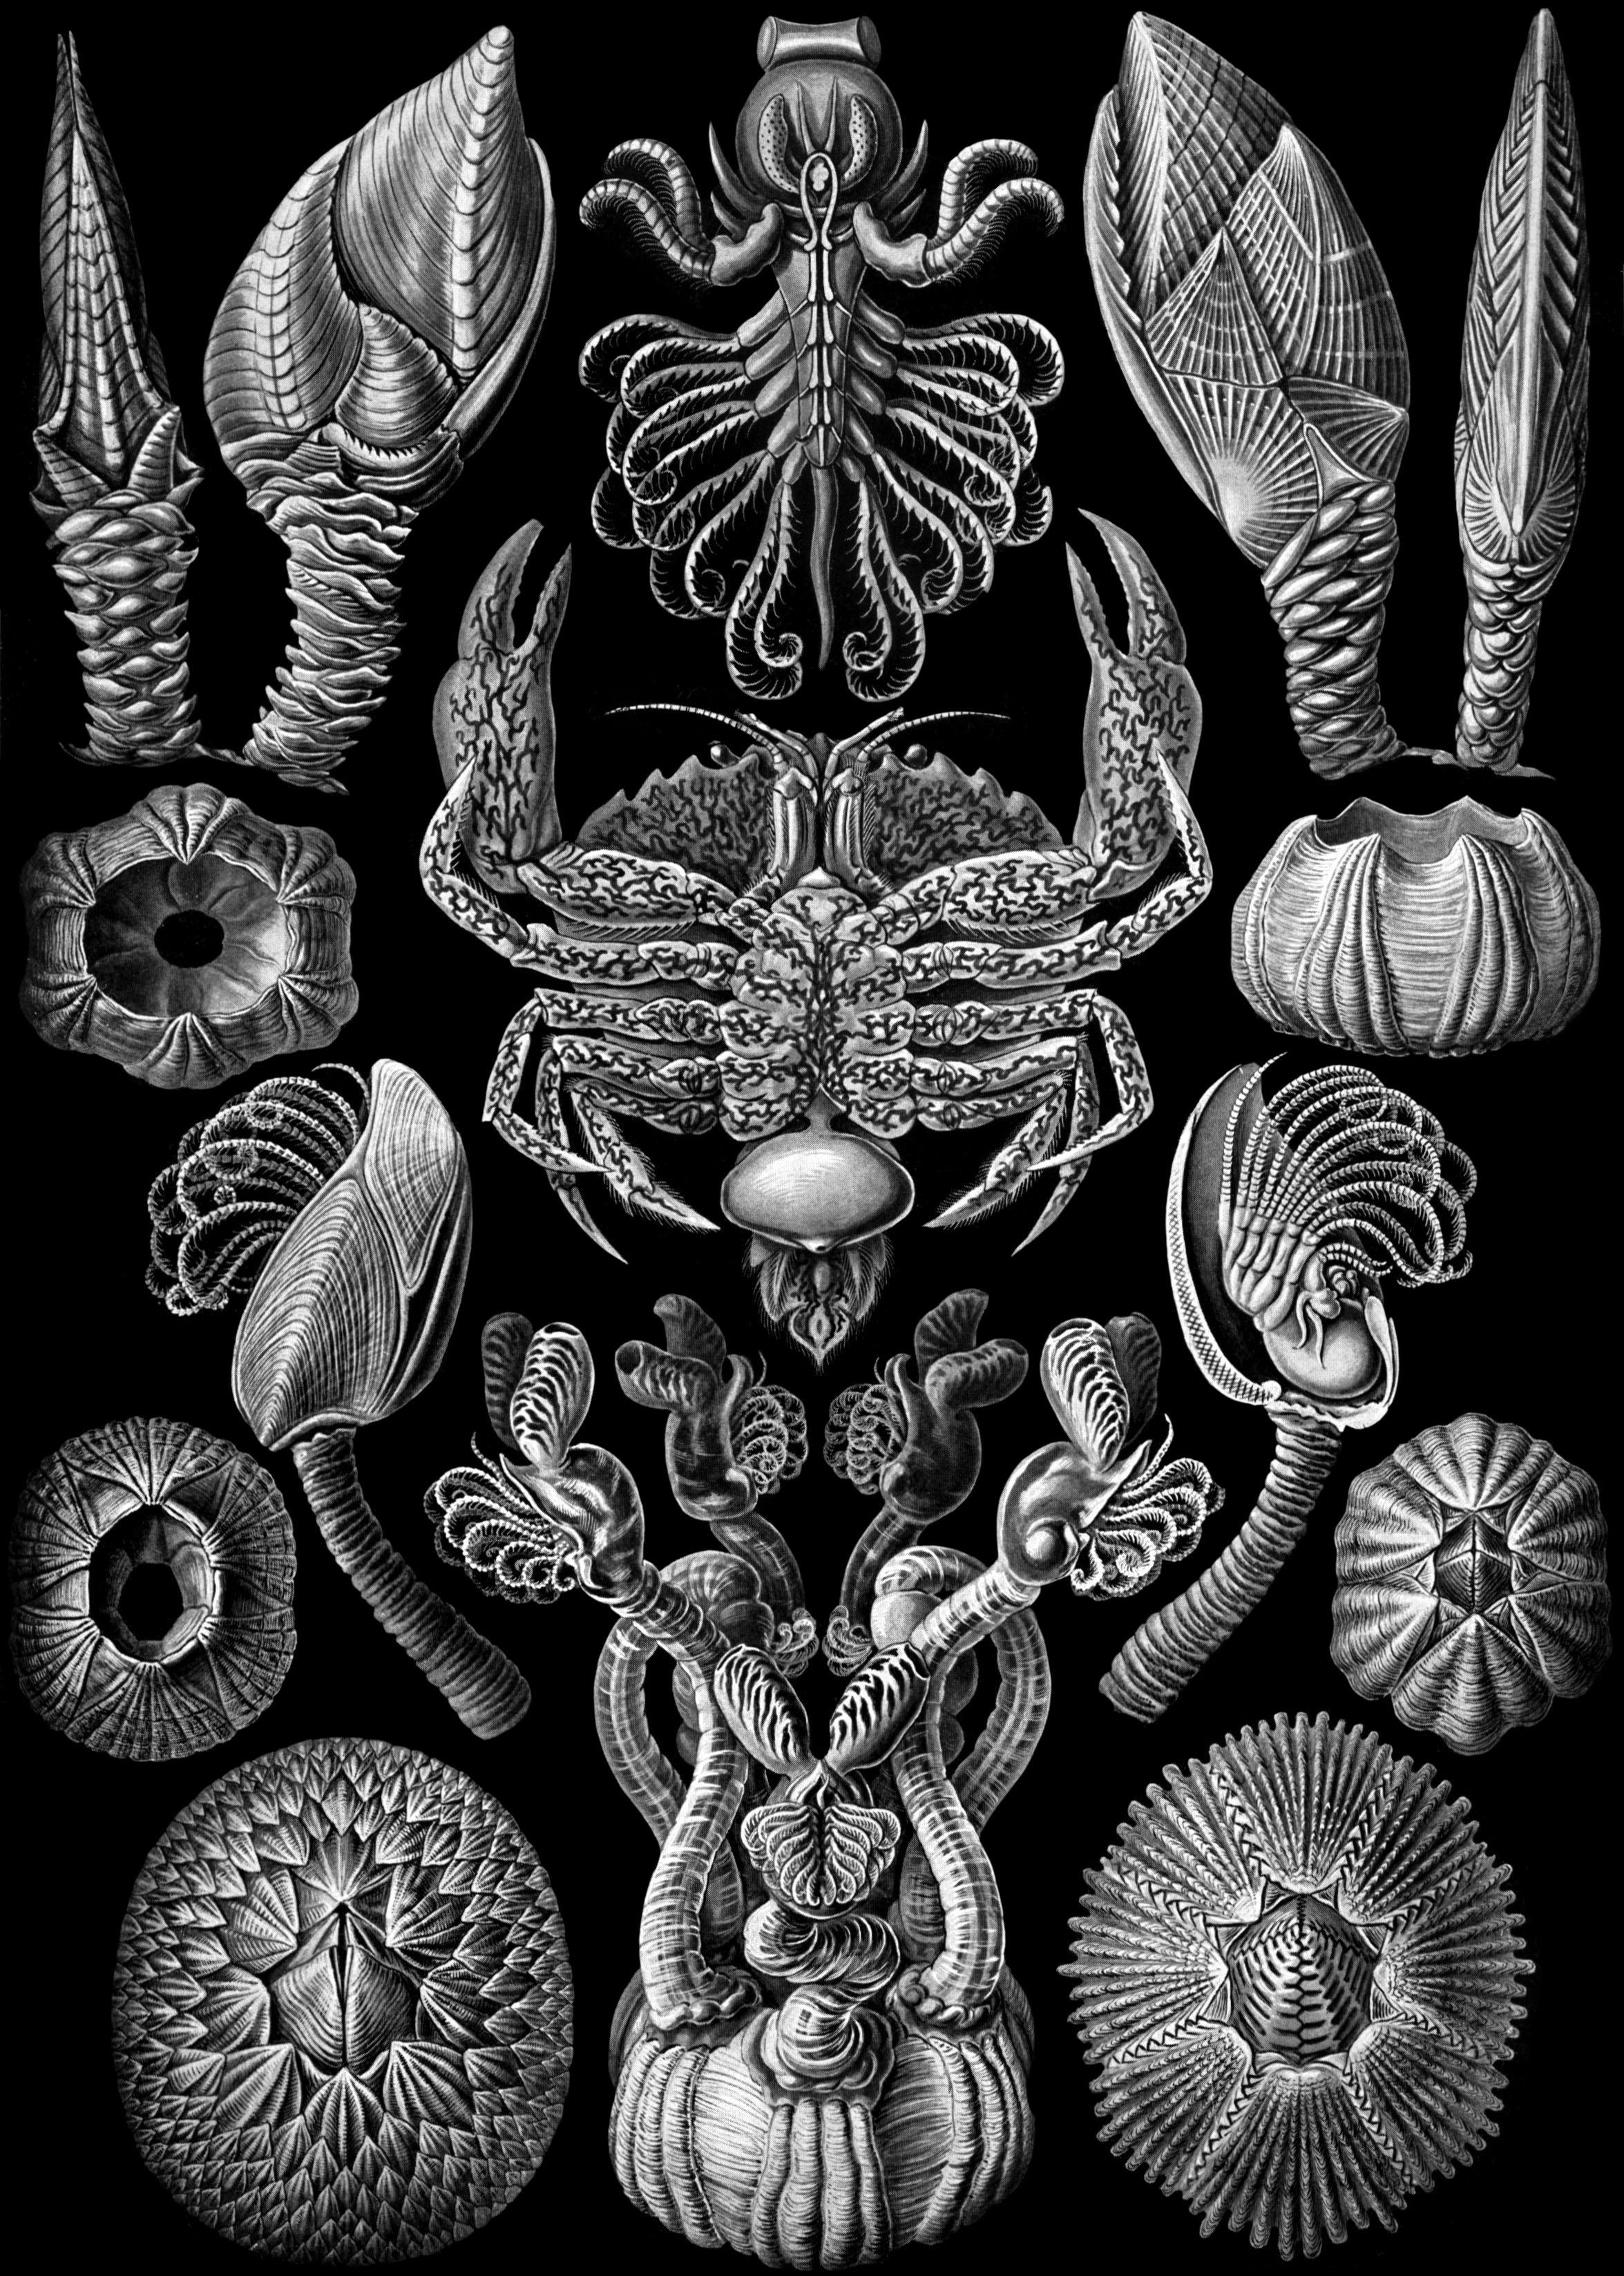 Gooseneck Barnacle Drawing History of Taxonomy[edit